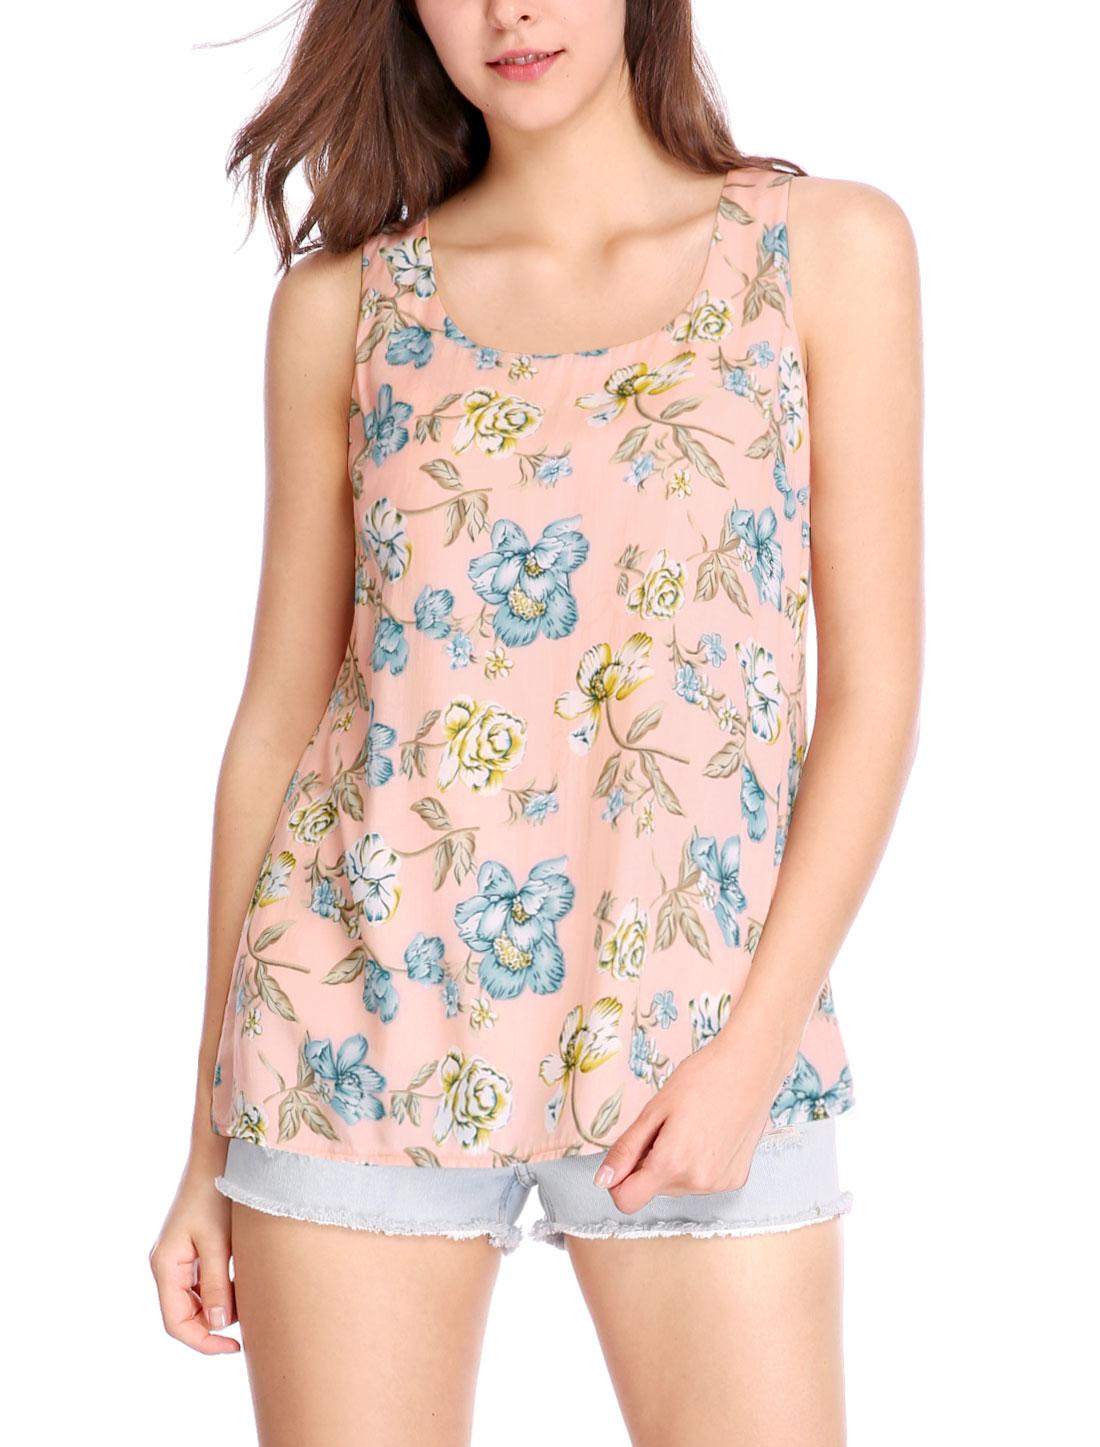 Women Floral Prints Sleeveless Scoop Neck Tank Top Pink M